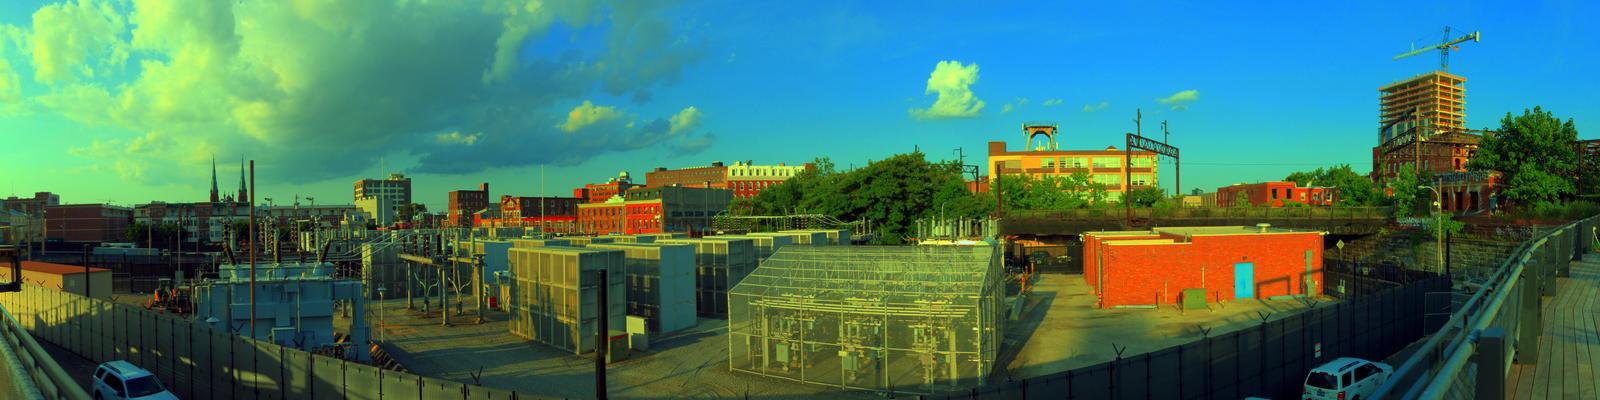 Panorama 3677 hdr pregamma 1 reinhard05 brightness by bruhinb